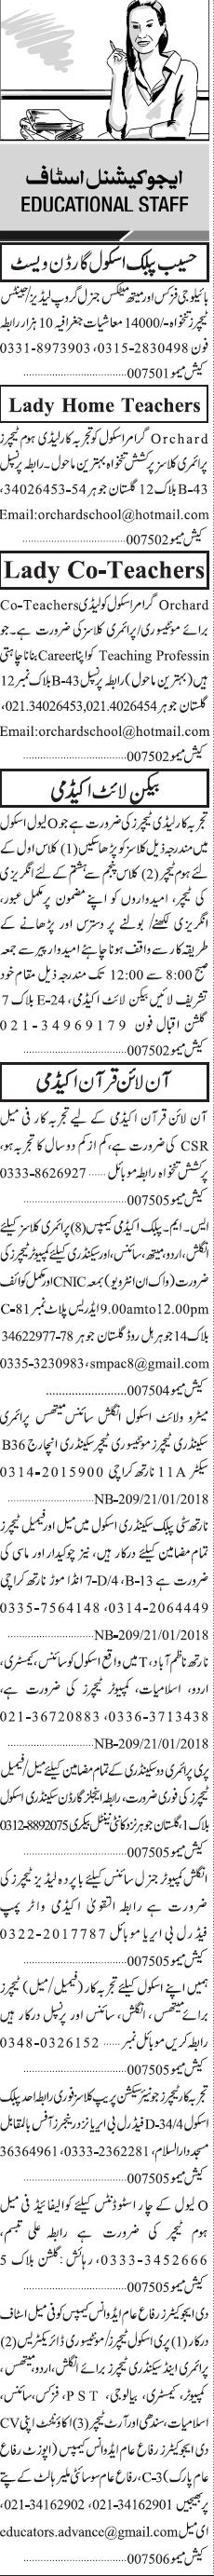 Lady Teachers, English Teachers, Principal Wanted